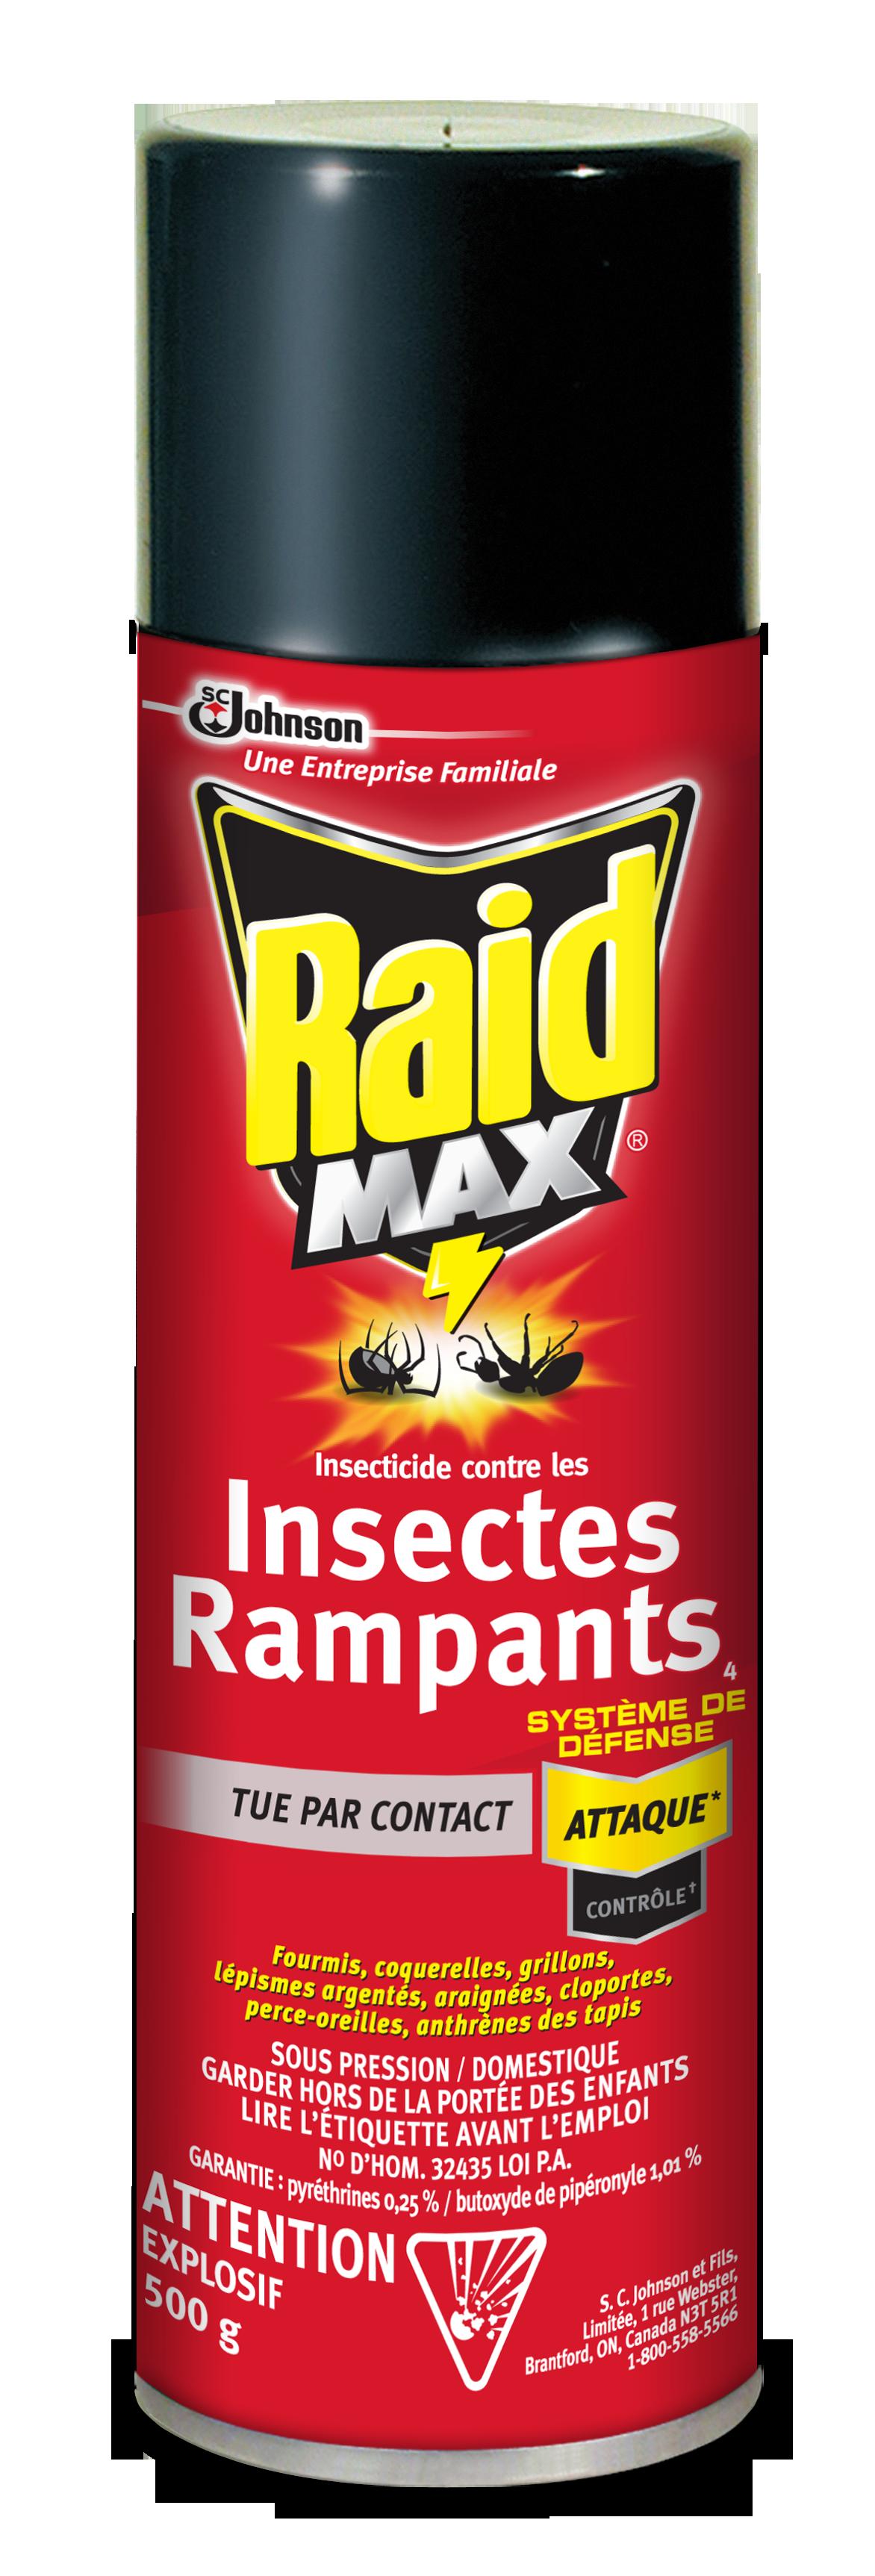 Assaut du raid à Saint-Denis Raid-max-crawling-insect-bug-killer